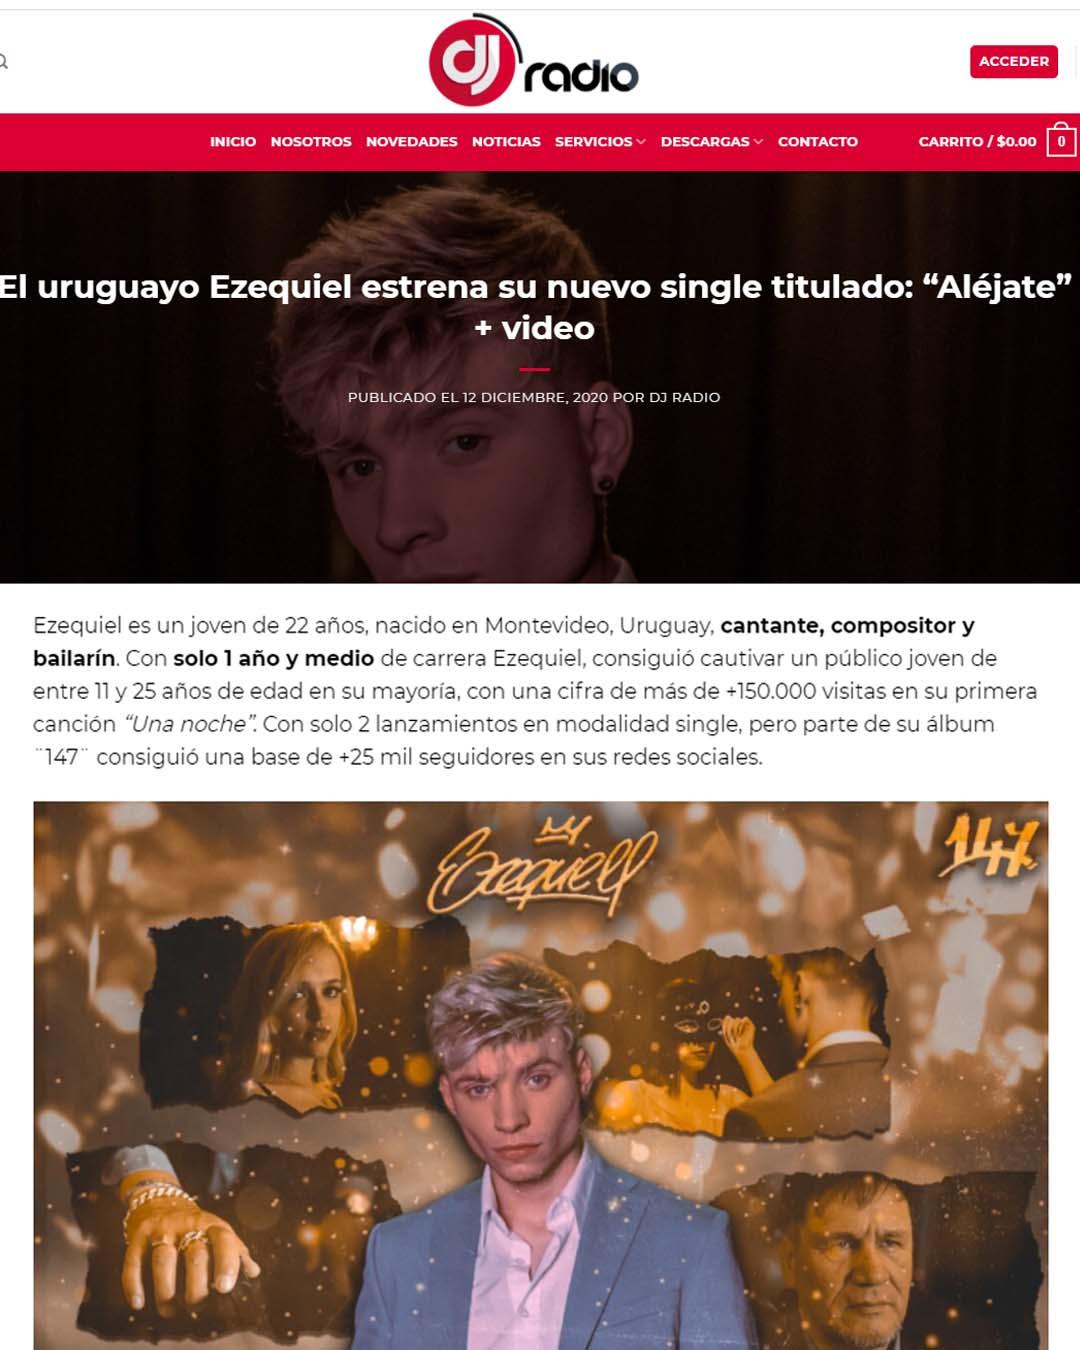 PRENSA RADIO EZEQUIEL